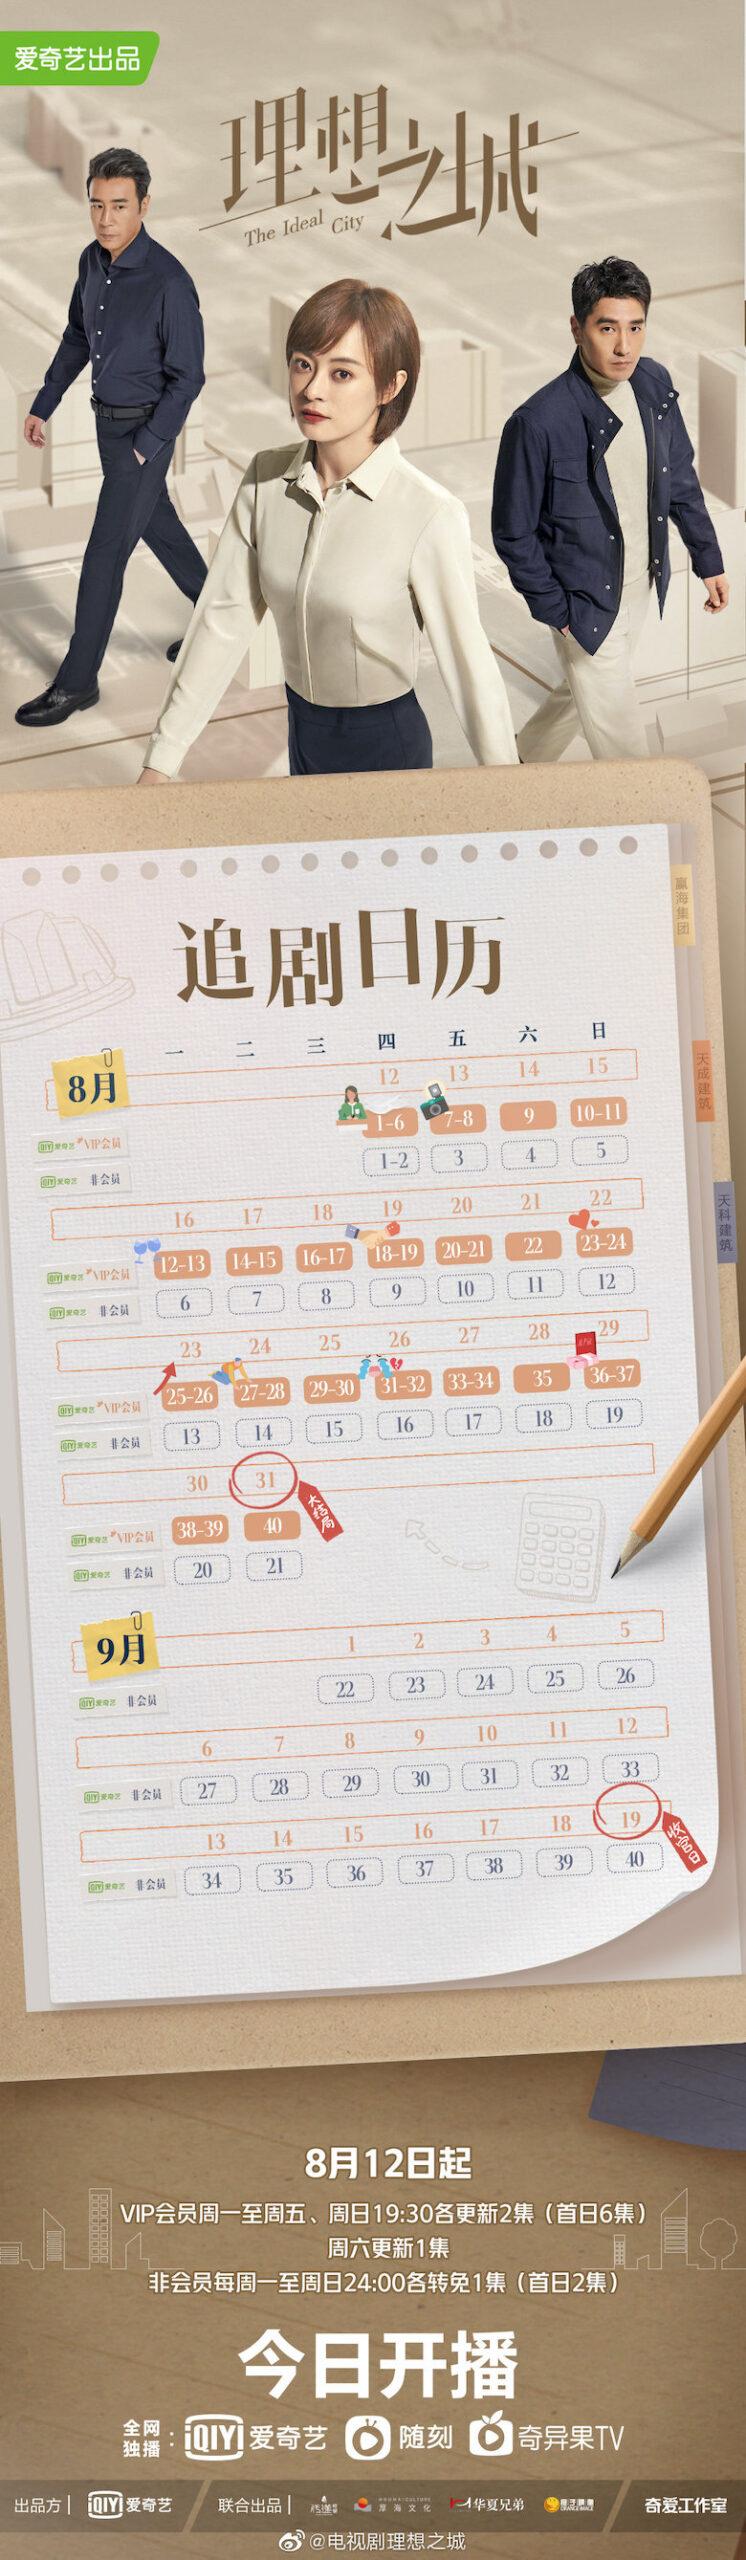 The Ideal City Chinese Drama Airing Calendar